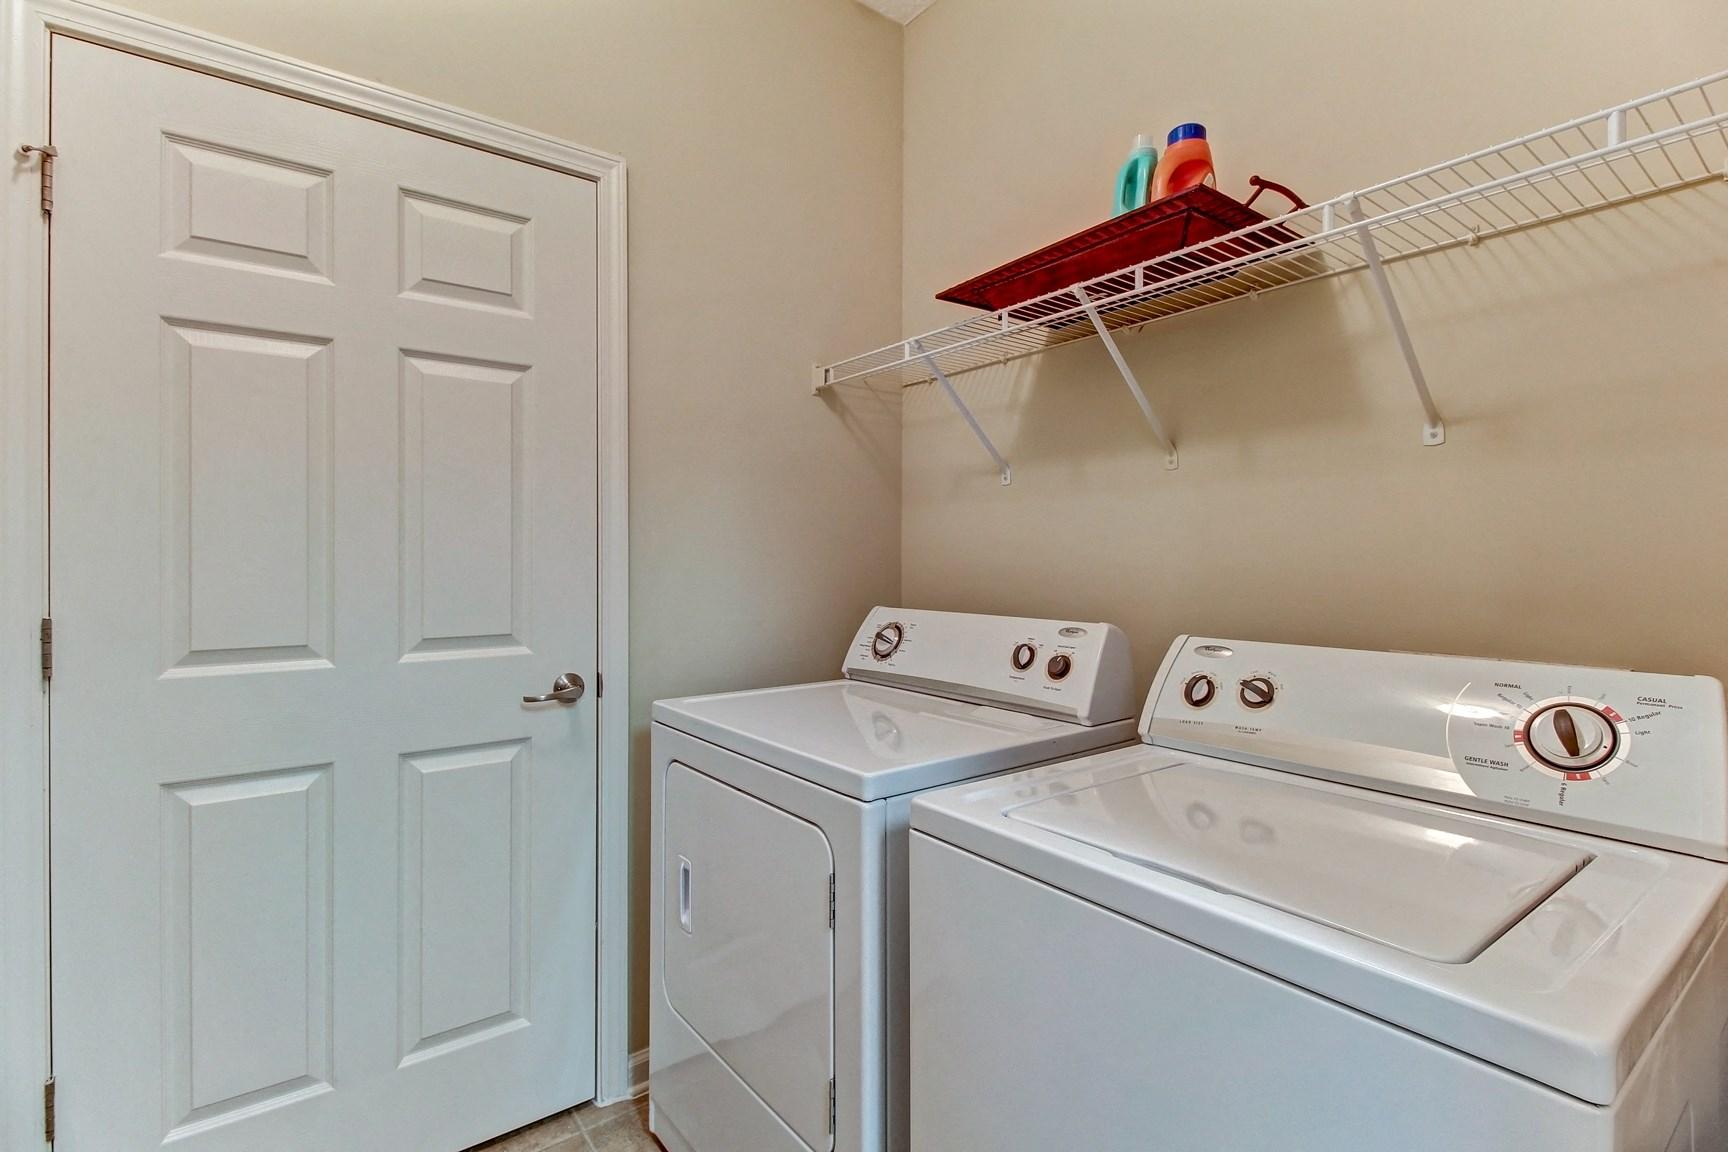 Laundry Room at Magnolia Village Apartments in Jacksonville, FL